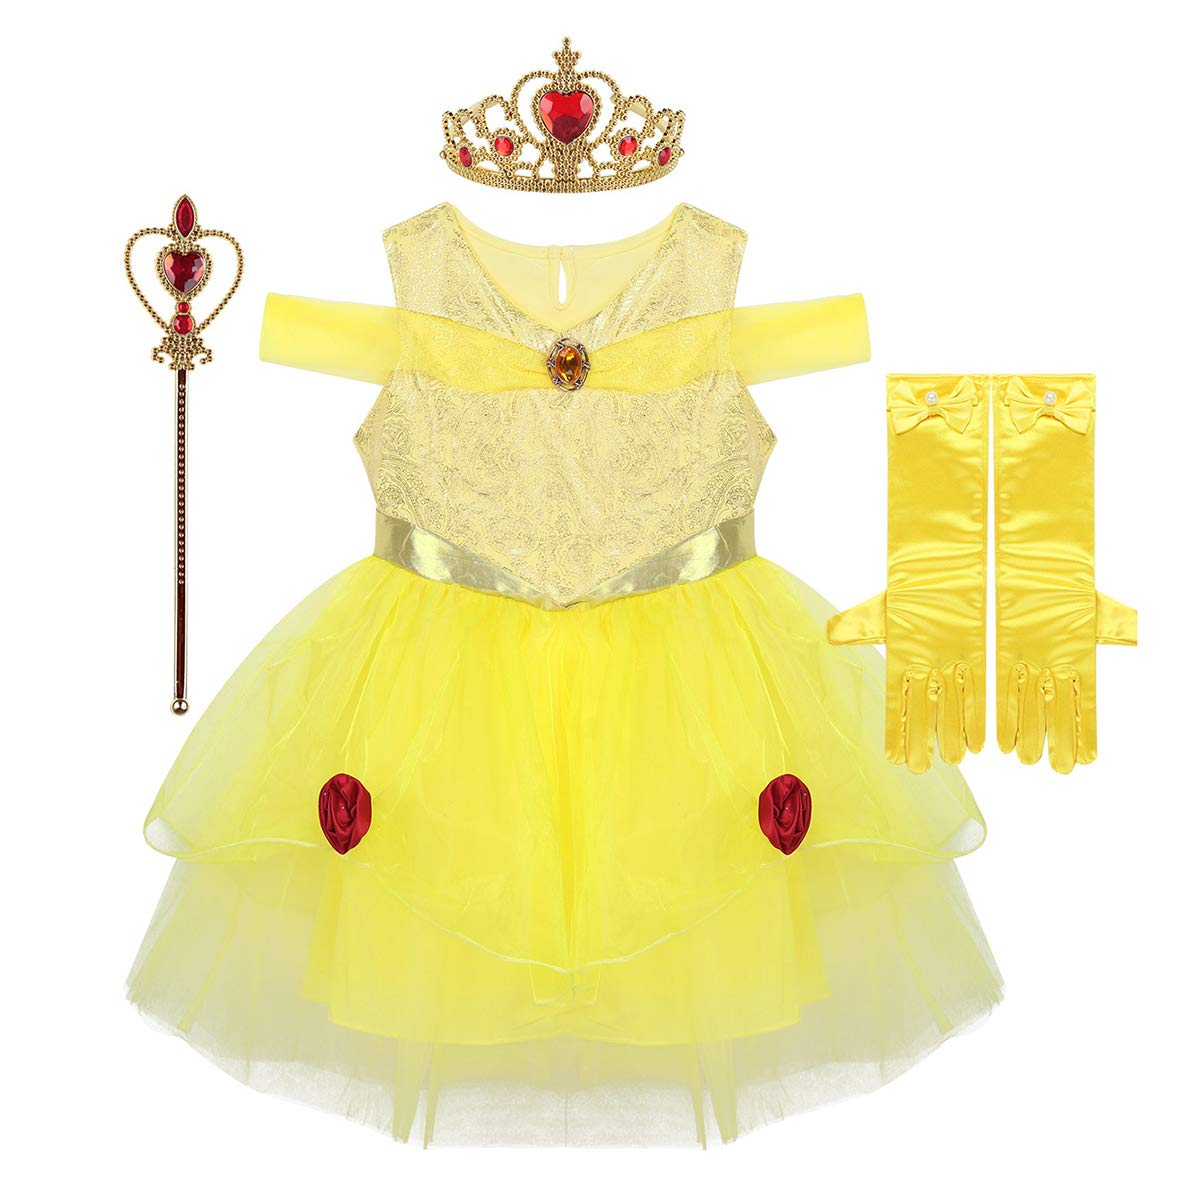 inhzoy Disfraz de Bella Princesa para Niña Cosplay 4Pcs ...